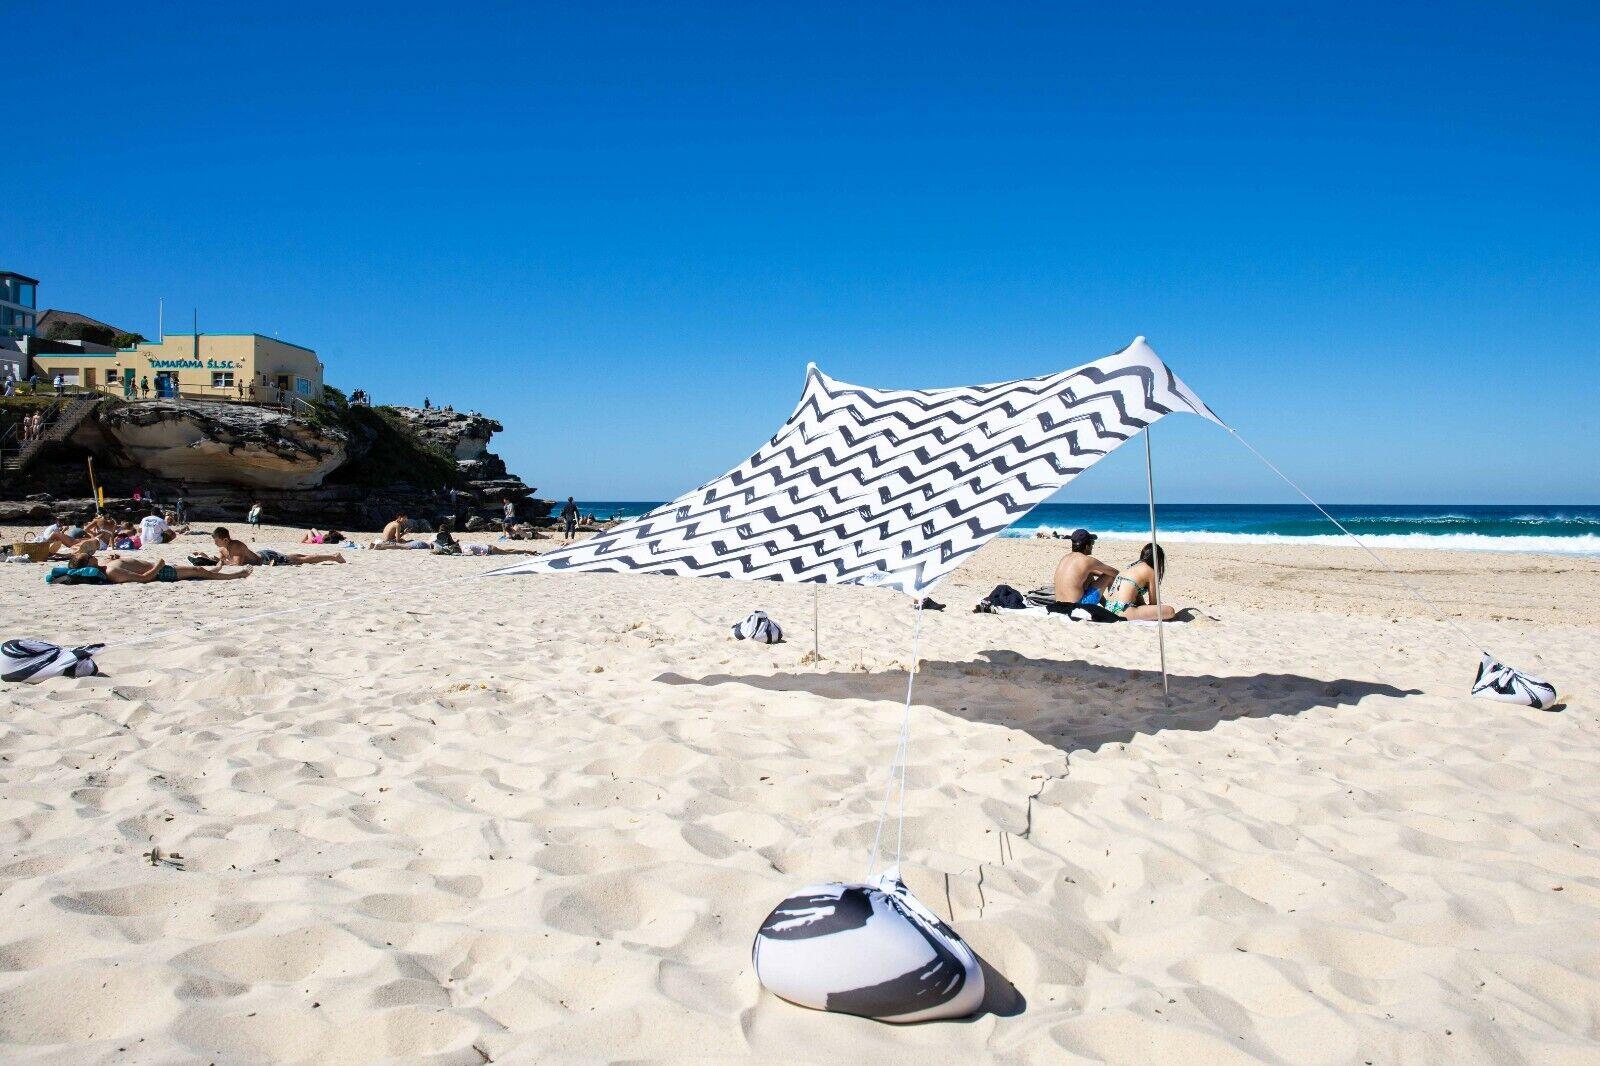 OZoola Swell Beach Tent With Sandbags UPF 50+ Sun Protection